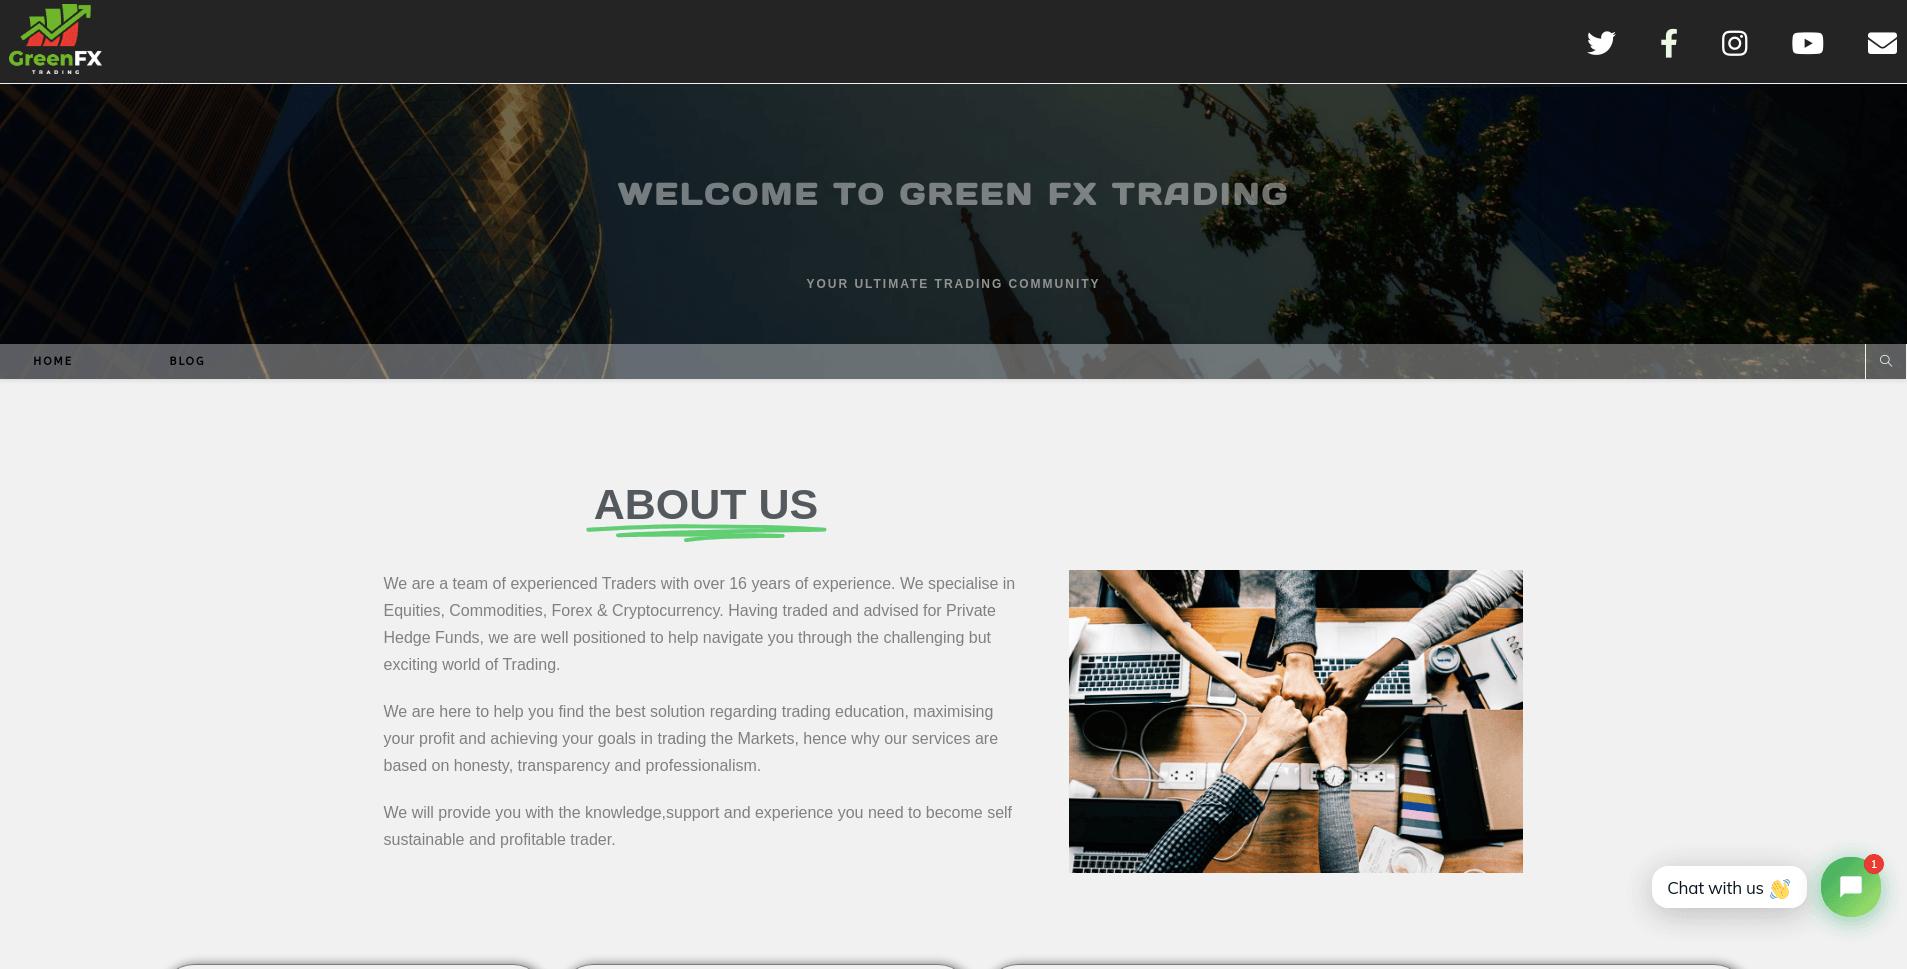 GreenFX scam